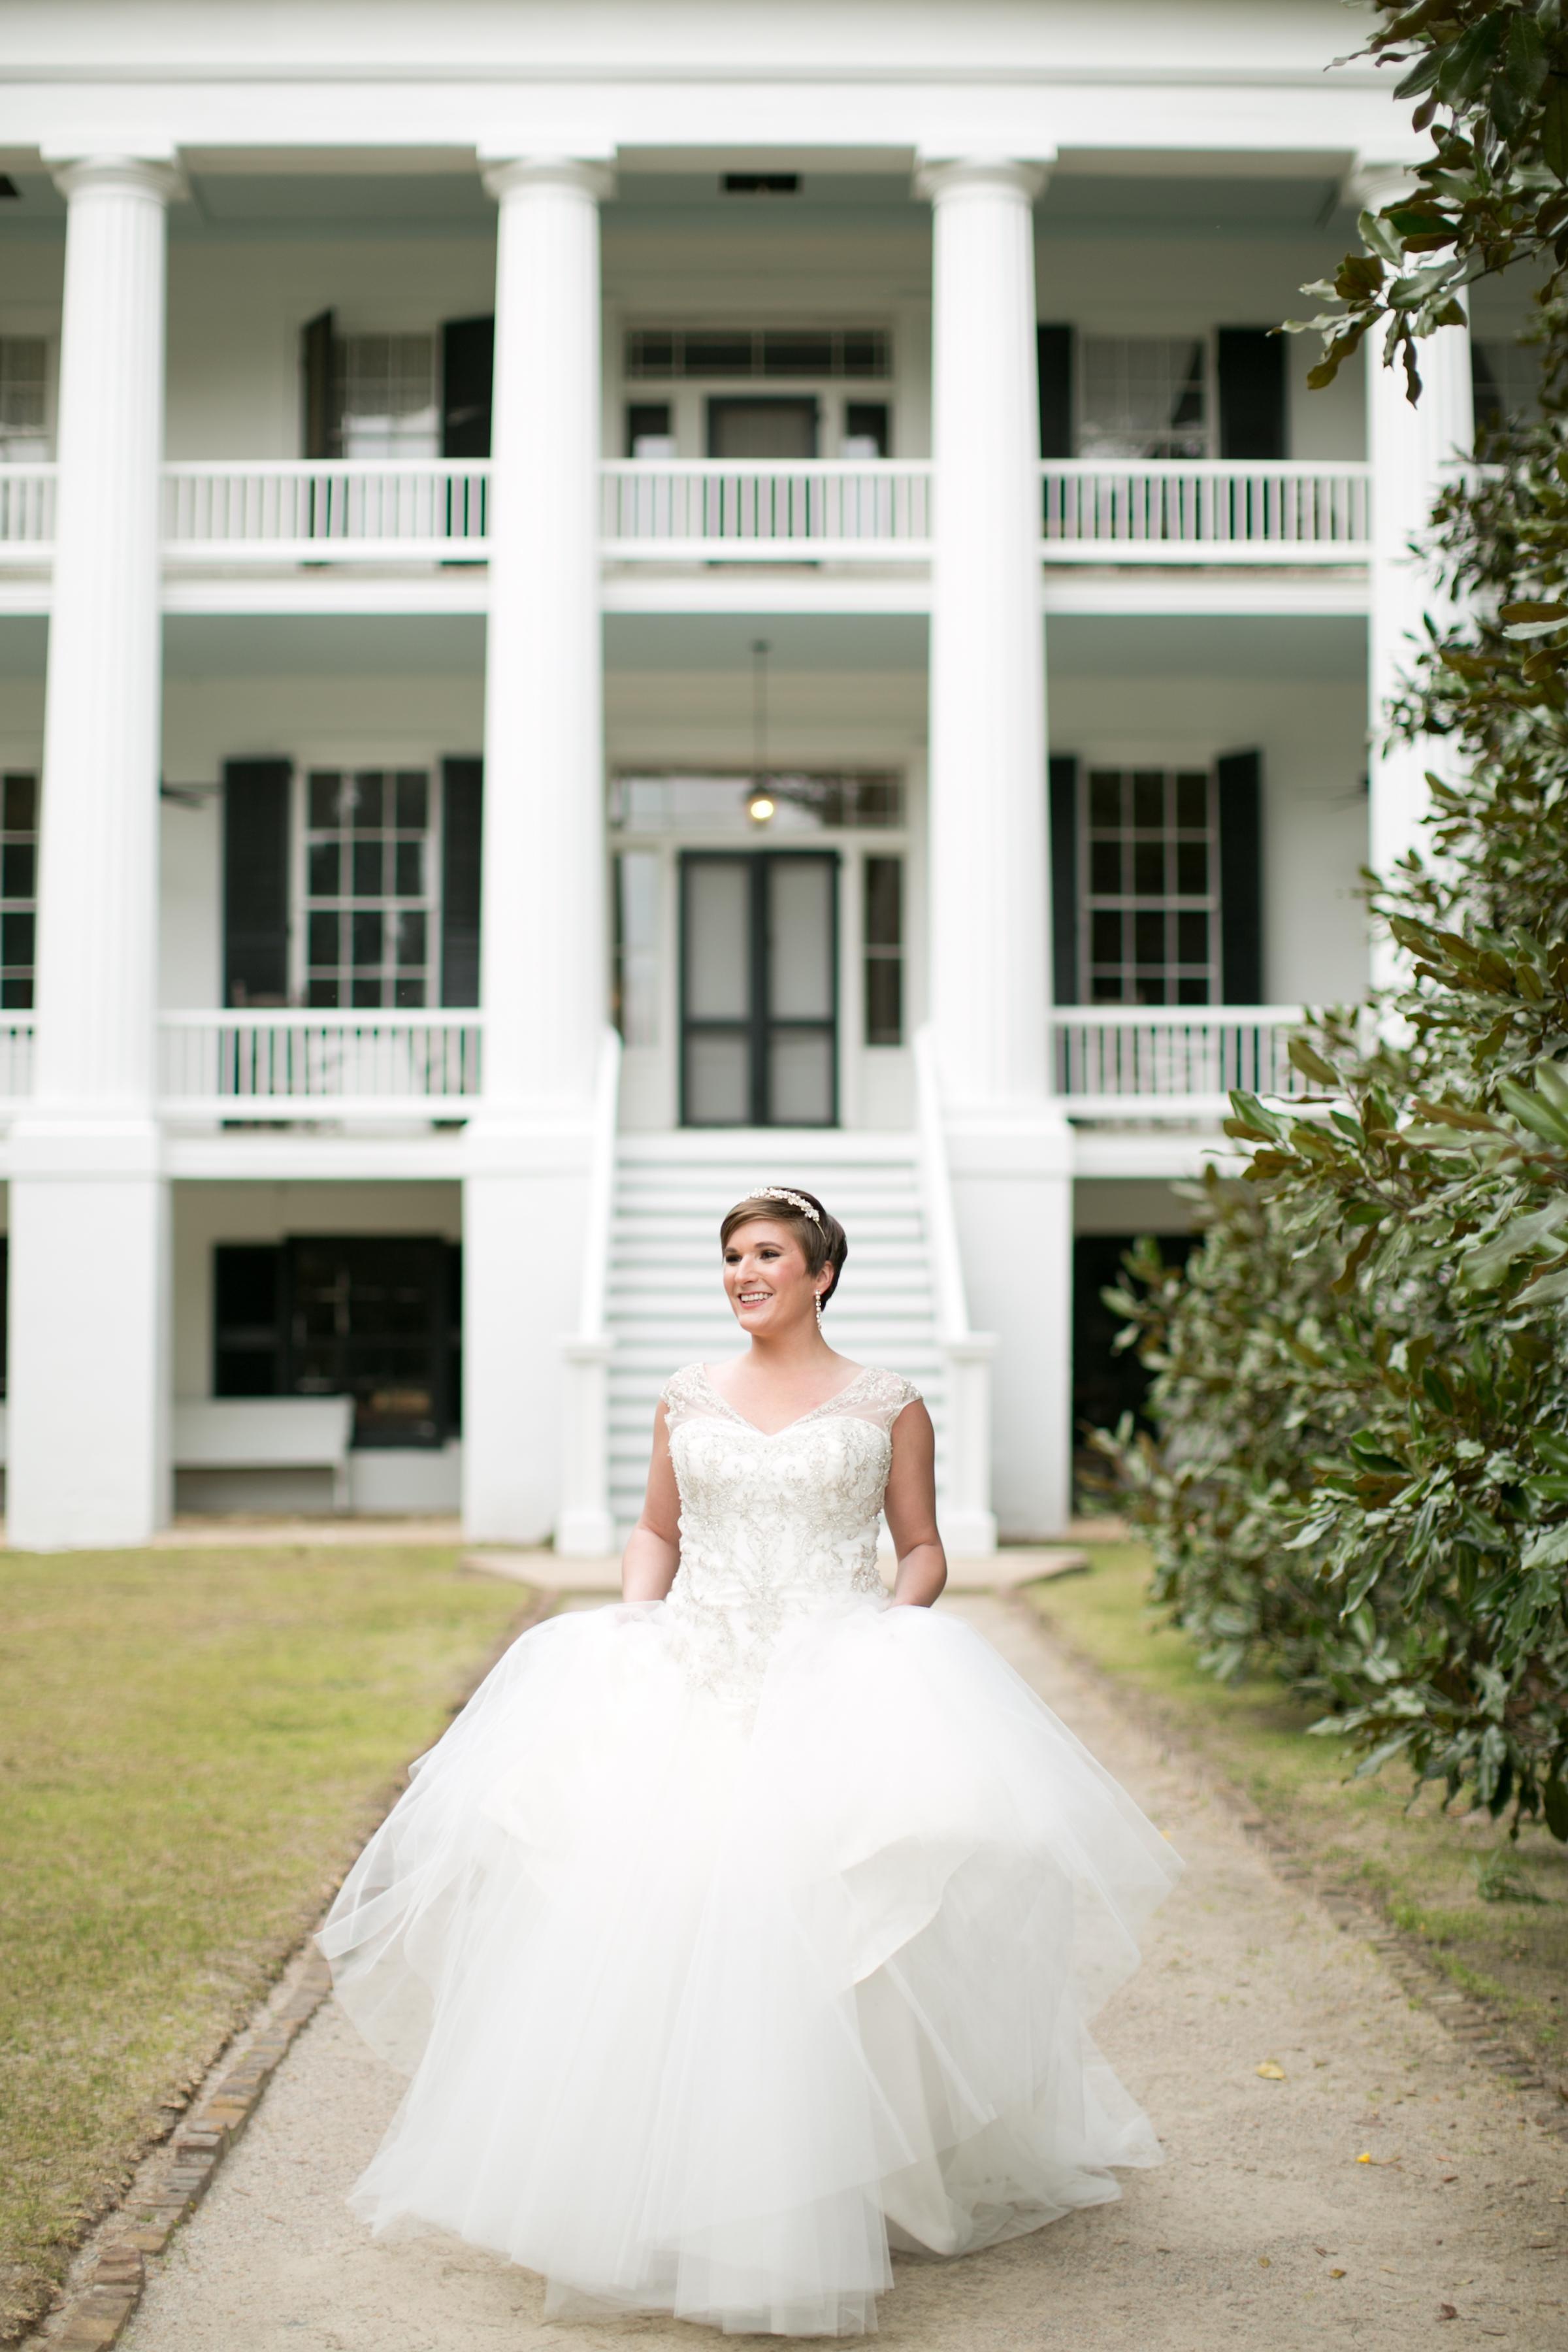 wavering_place_wedding23.jpg